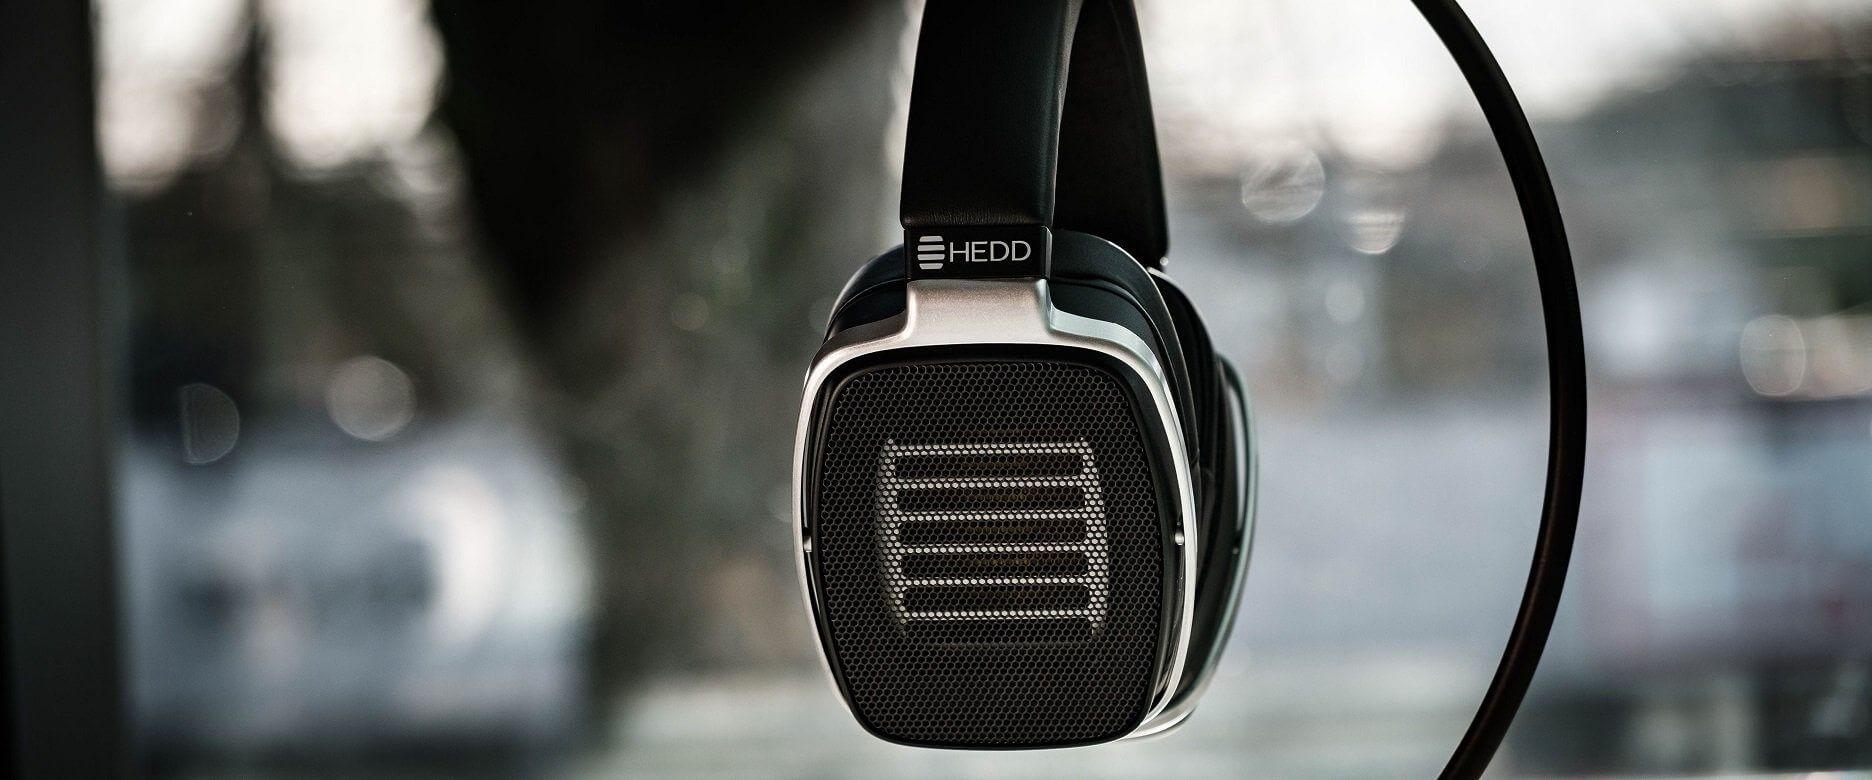 HEDD Audio HEDDphone: AMT Driver Headphone Review